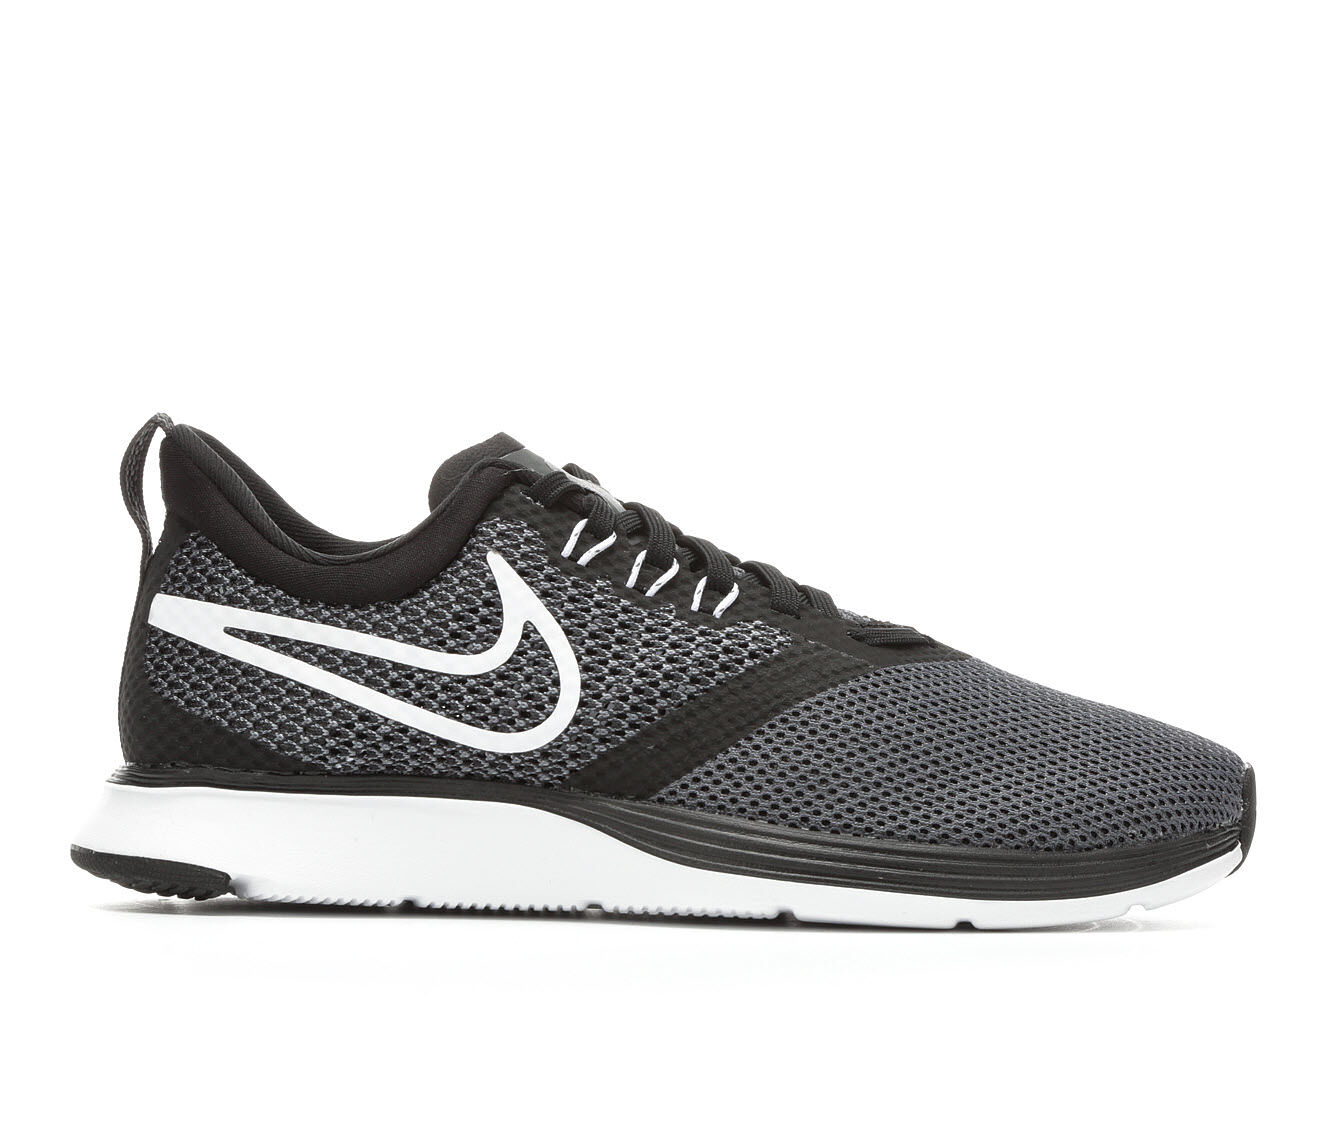 Nike Strike Boys Running Shoes Black/Grey/White dA7032G